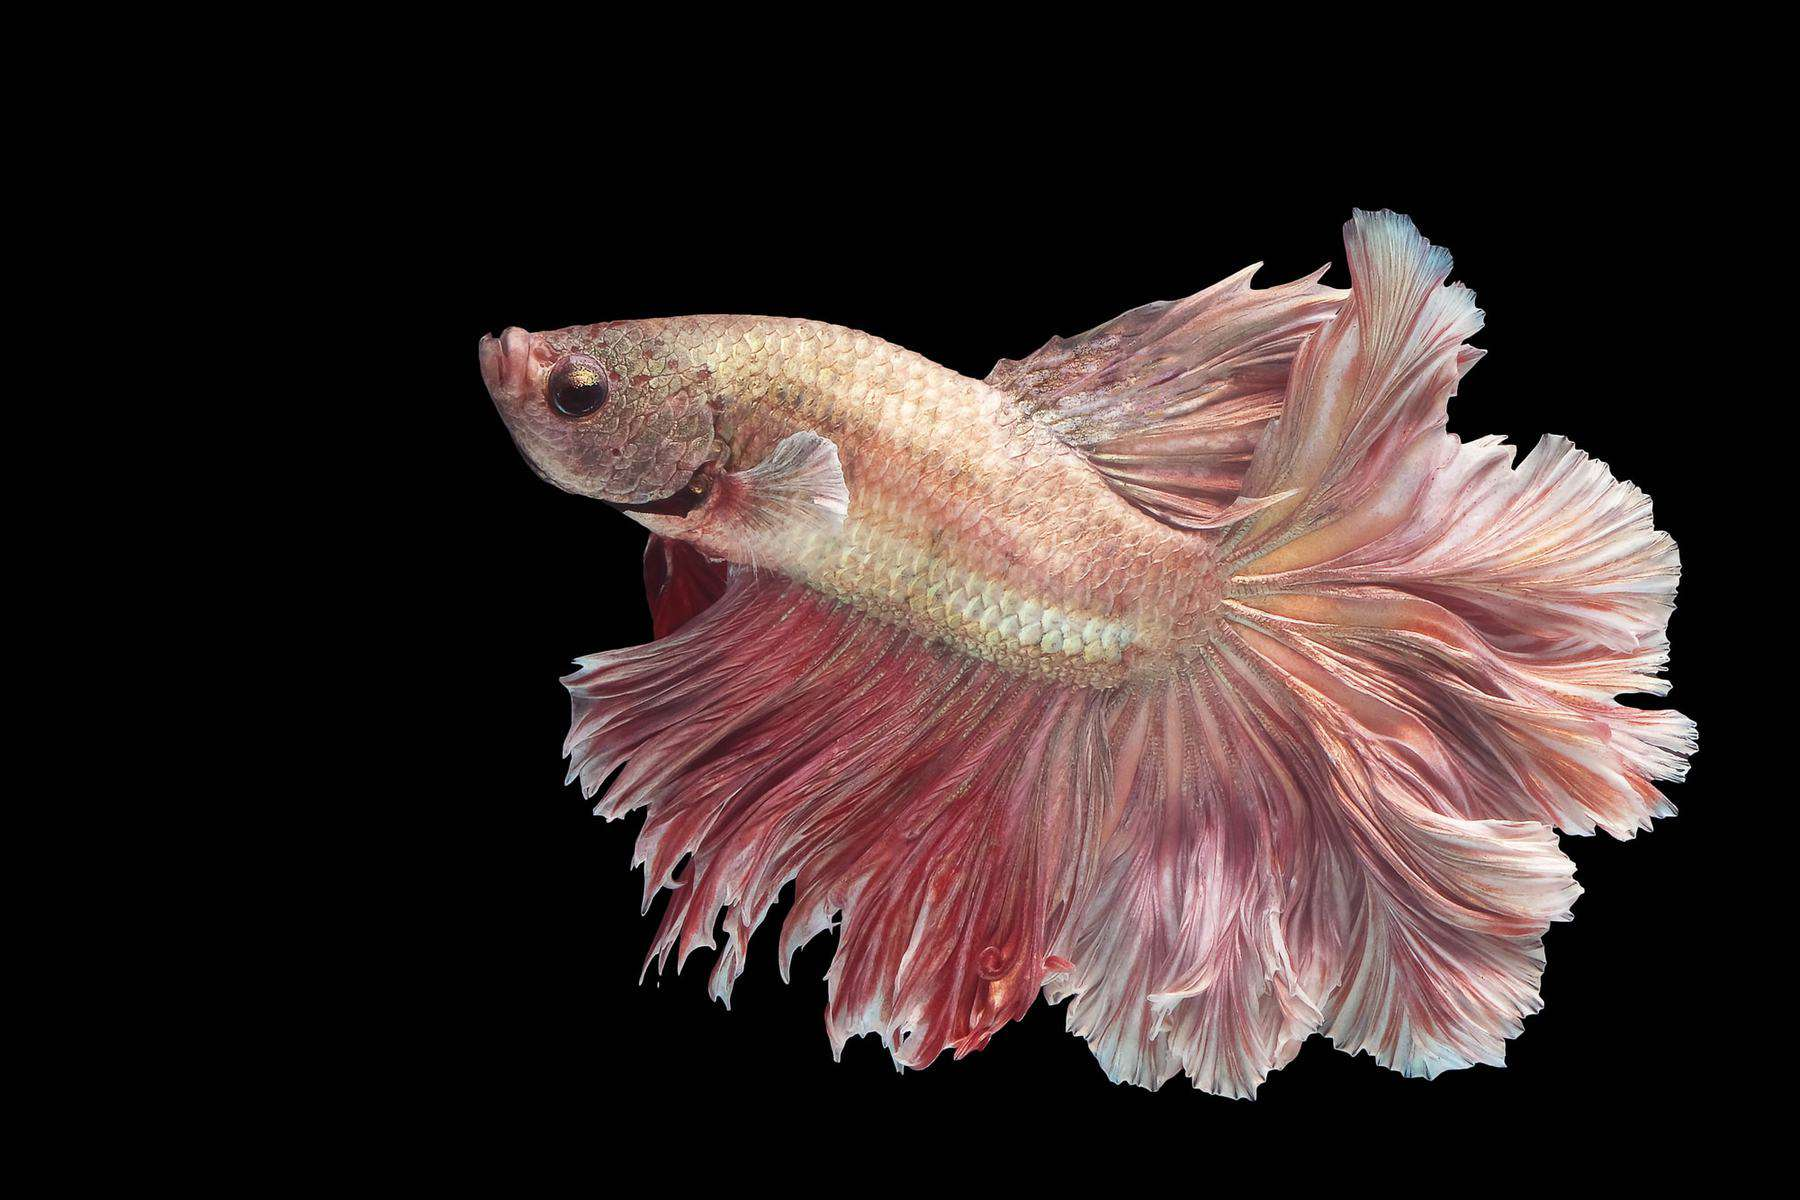 pale pink betta fish